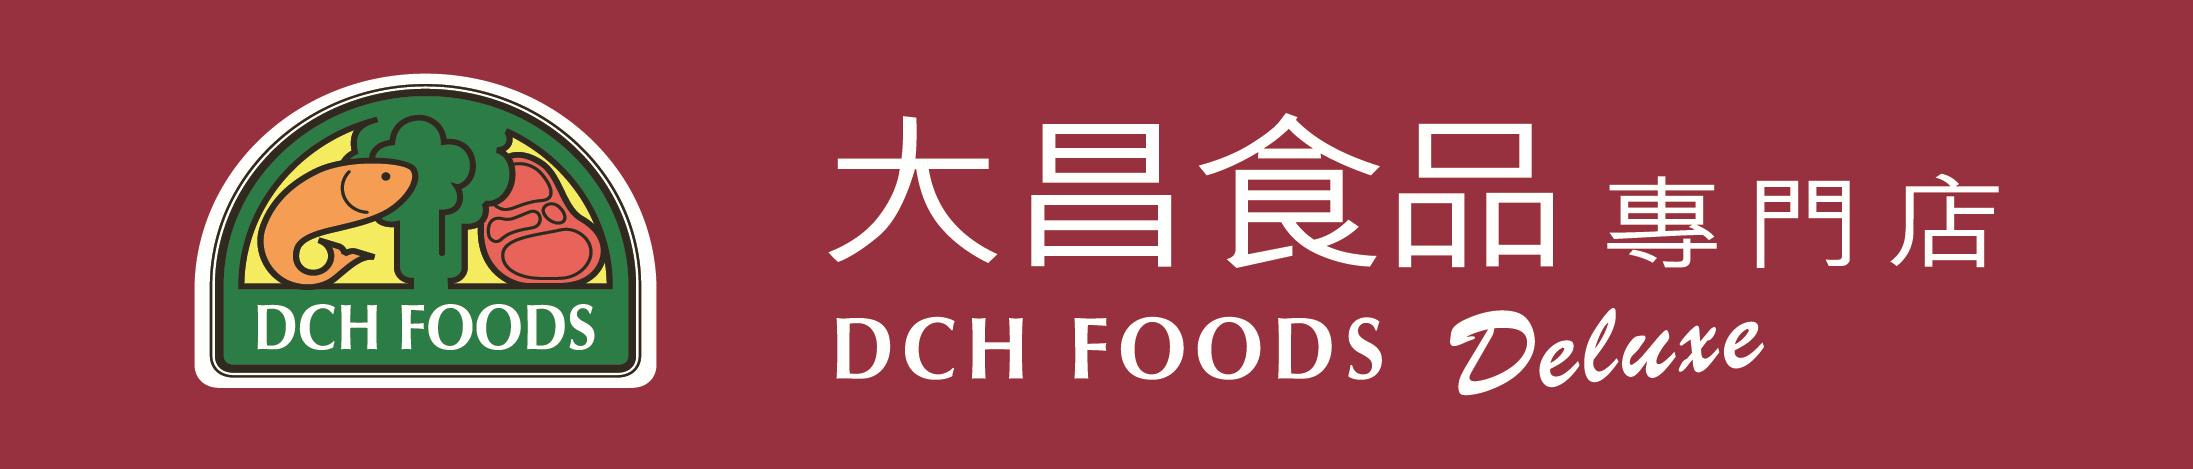 food scheme 2018 gold DCH FoodMart